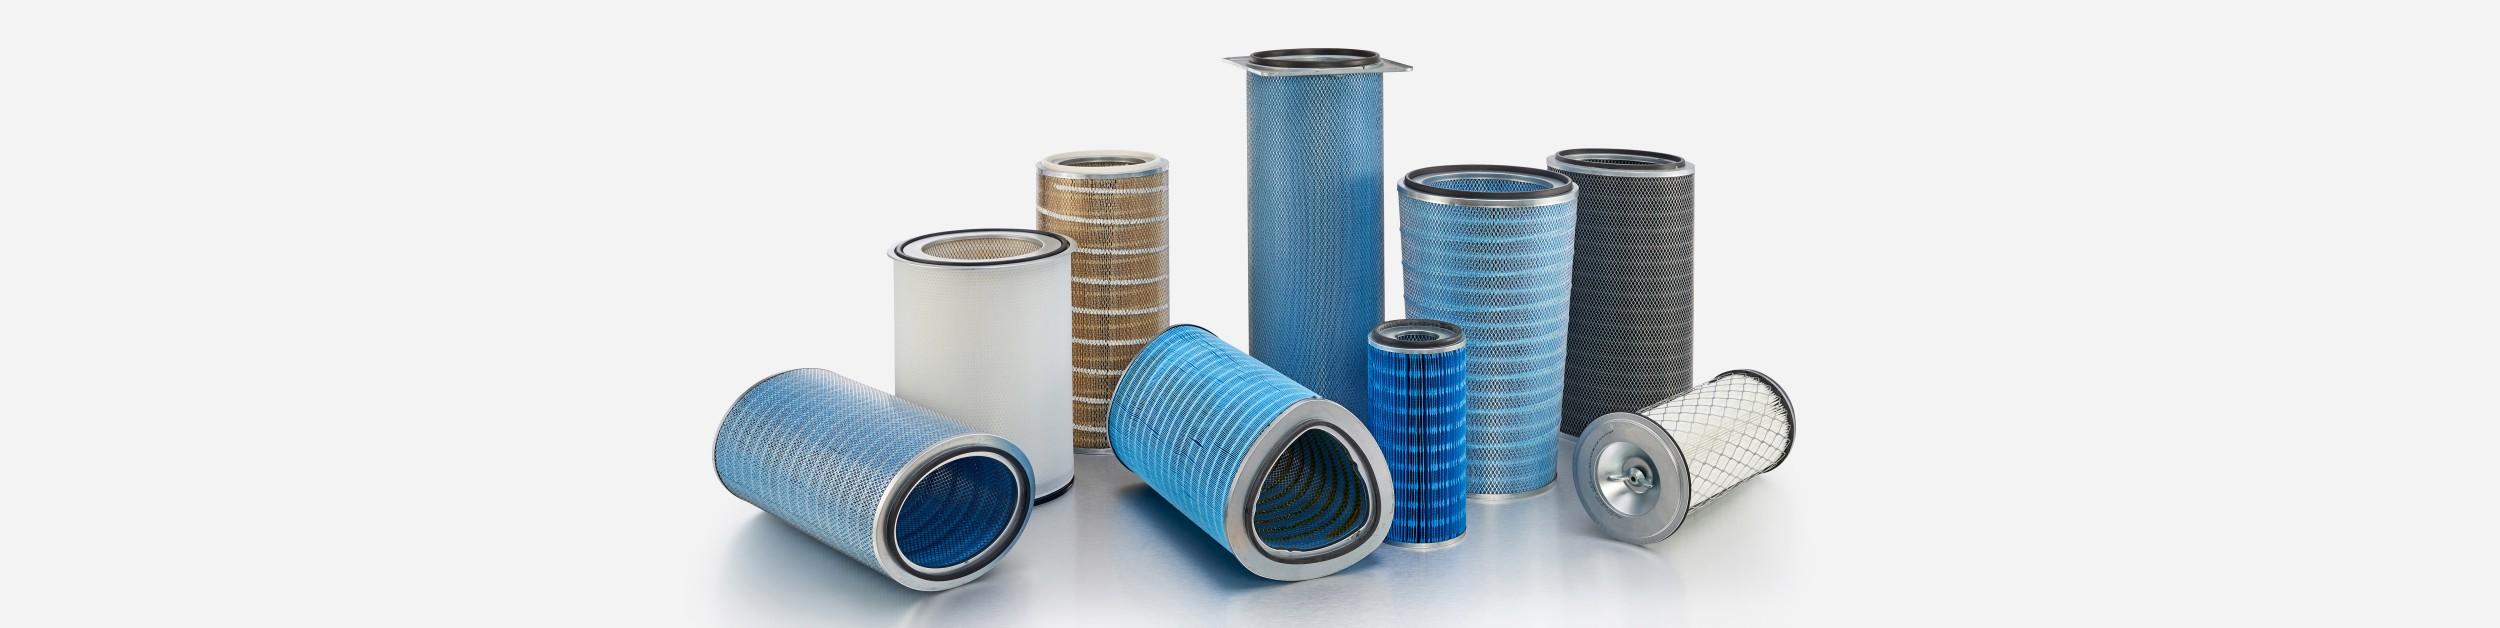 Donaldson cartridge filters - hero image   AIRPLUS Industrial